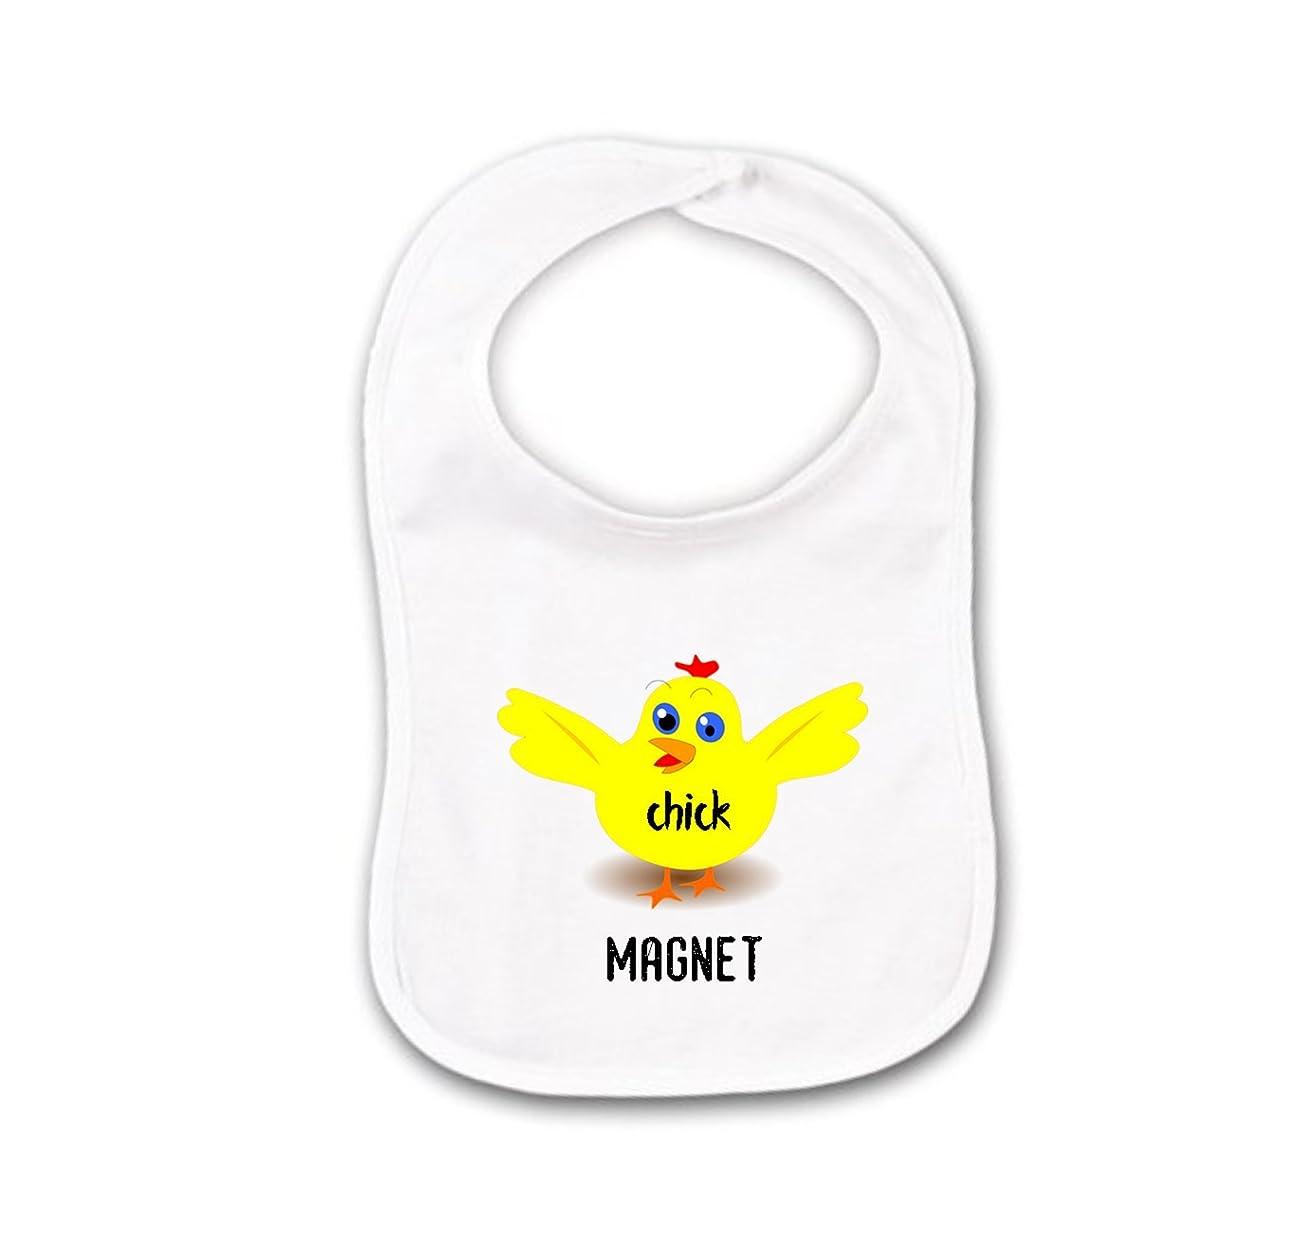 Chick Magnet for Chicken Farmer Baby Bib or Burp Cloth For Gender Neutral Unisex Girl or Boy